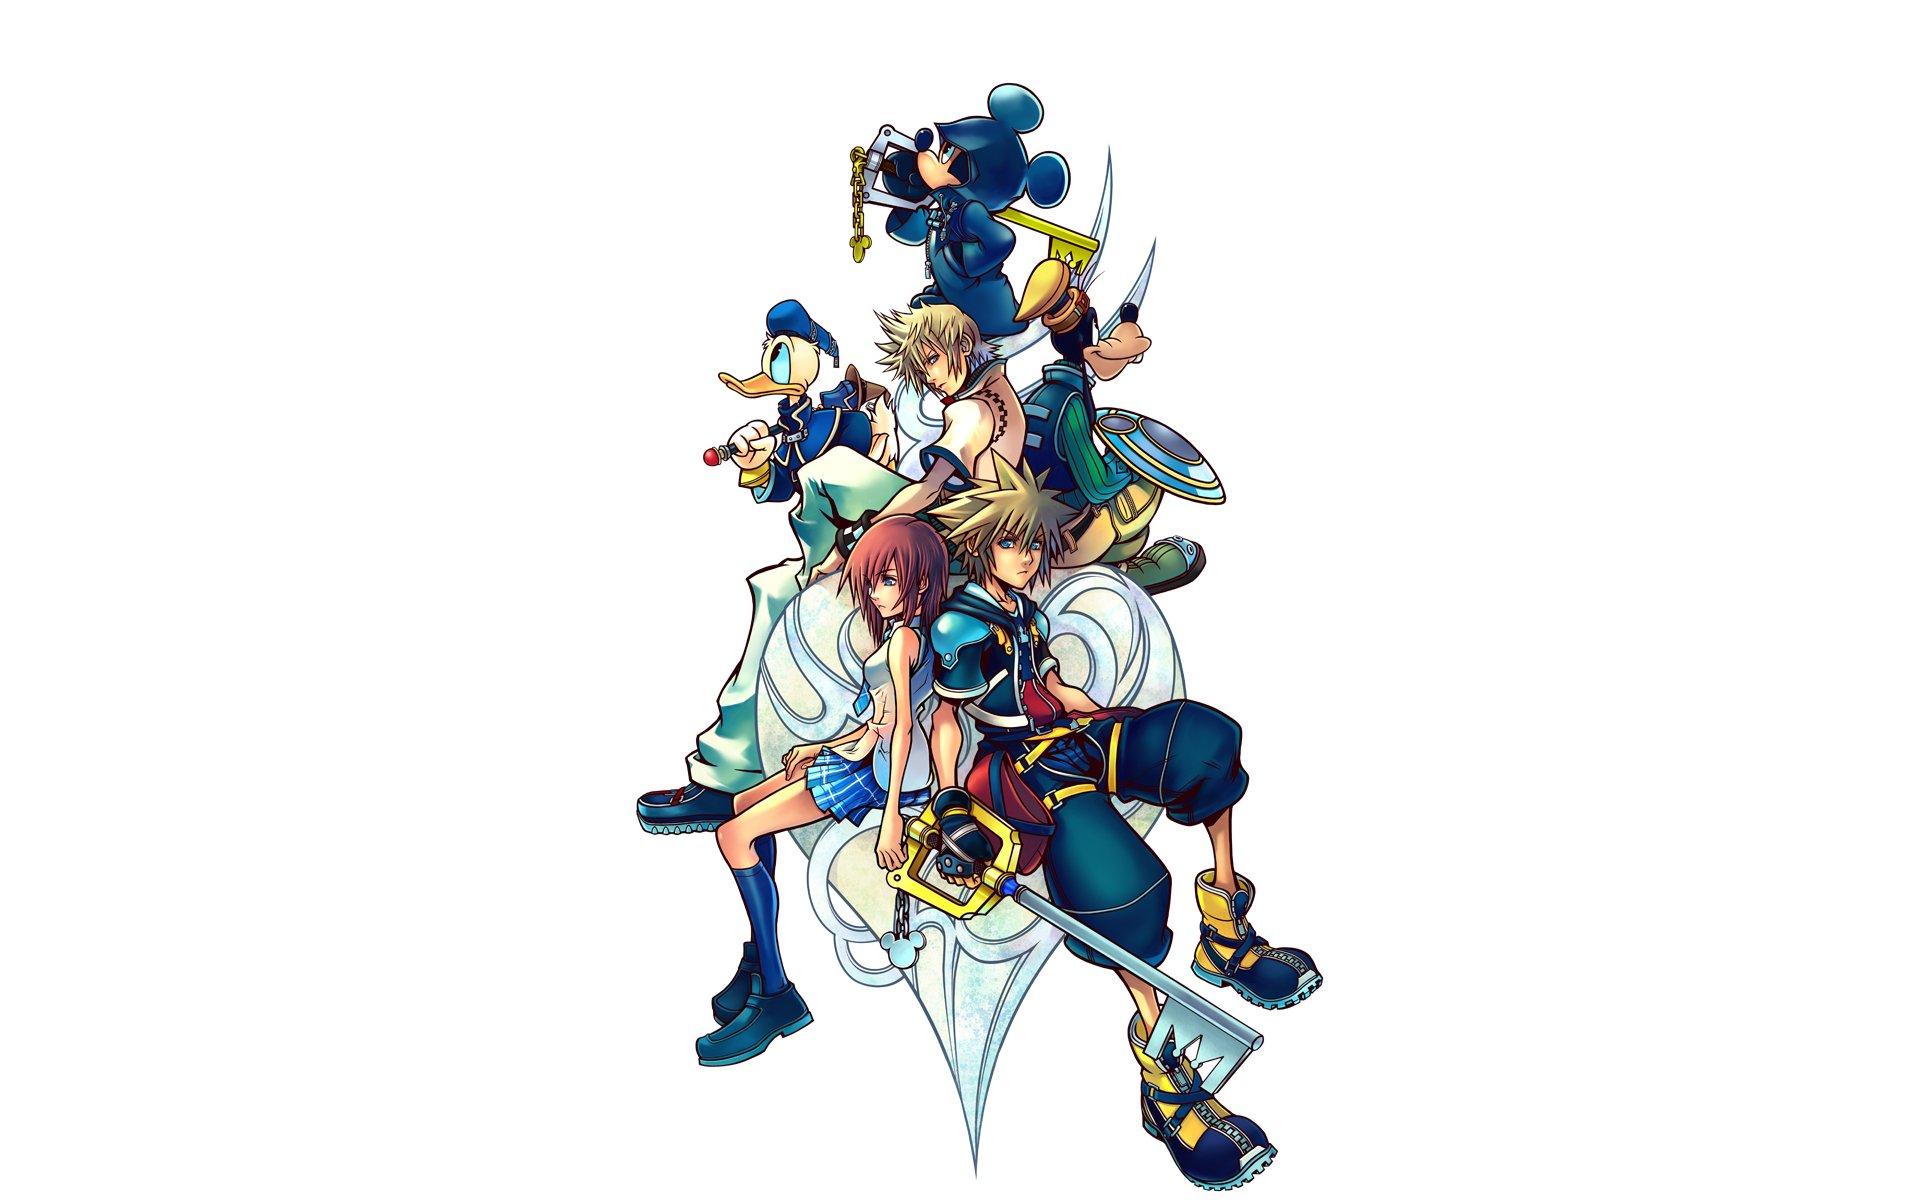 Kingdom Hearts 3 Hd Wallpaper Wallpapersafari